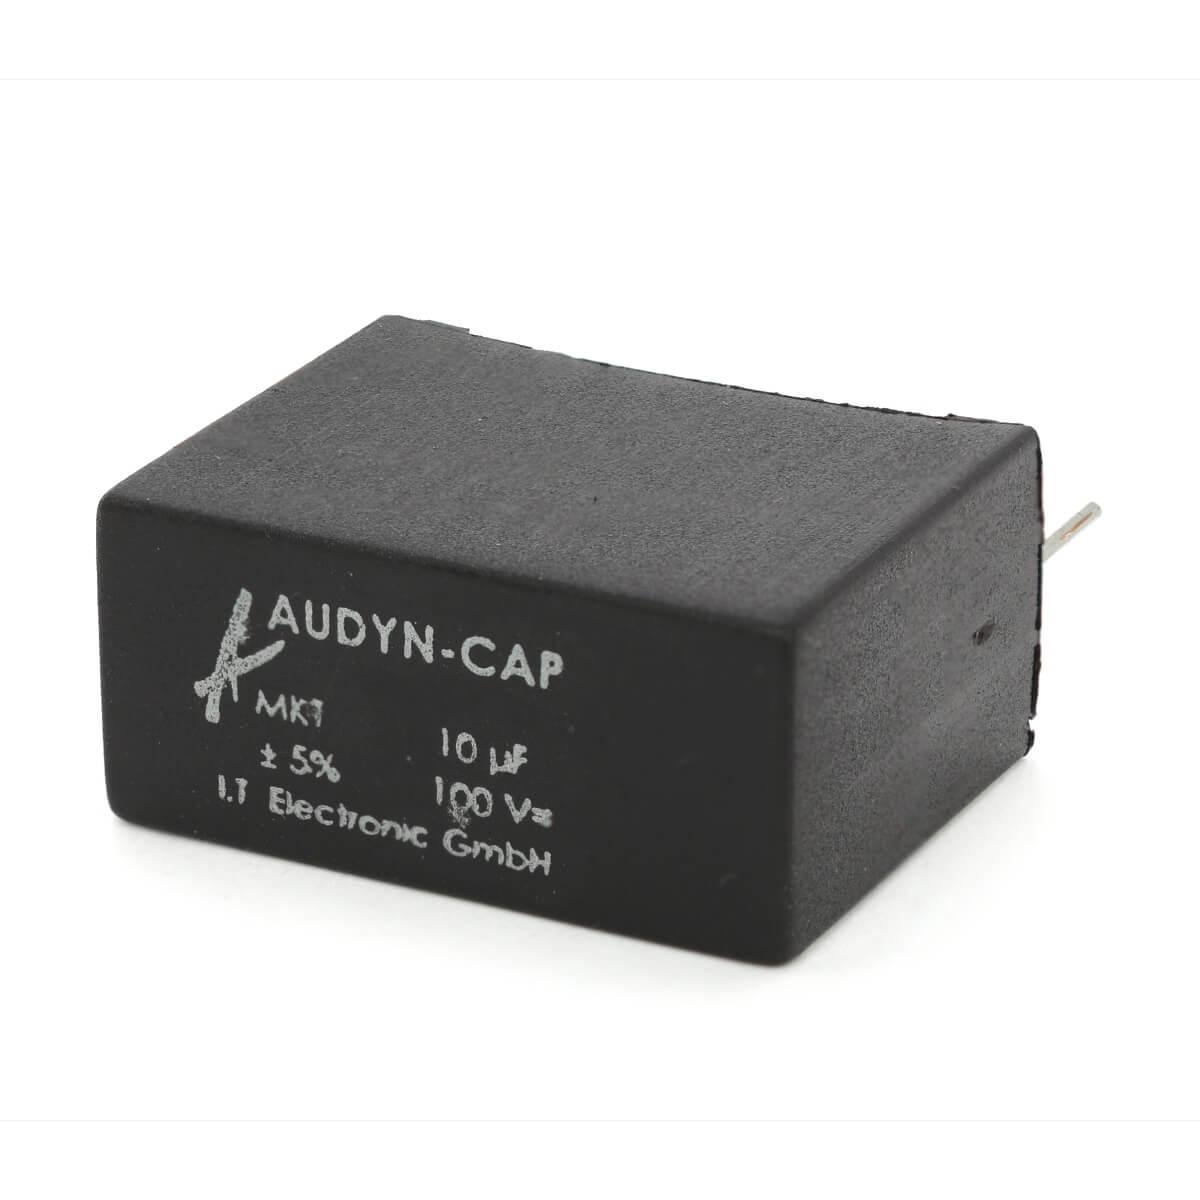 AUDYN CAP Radial MKT Capacitor 100V 2.2μF